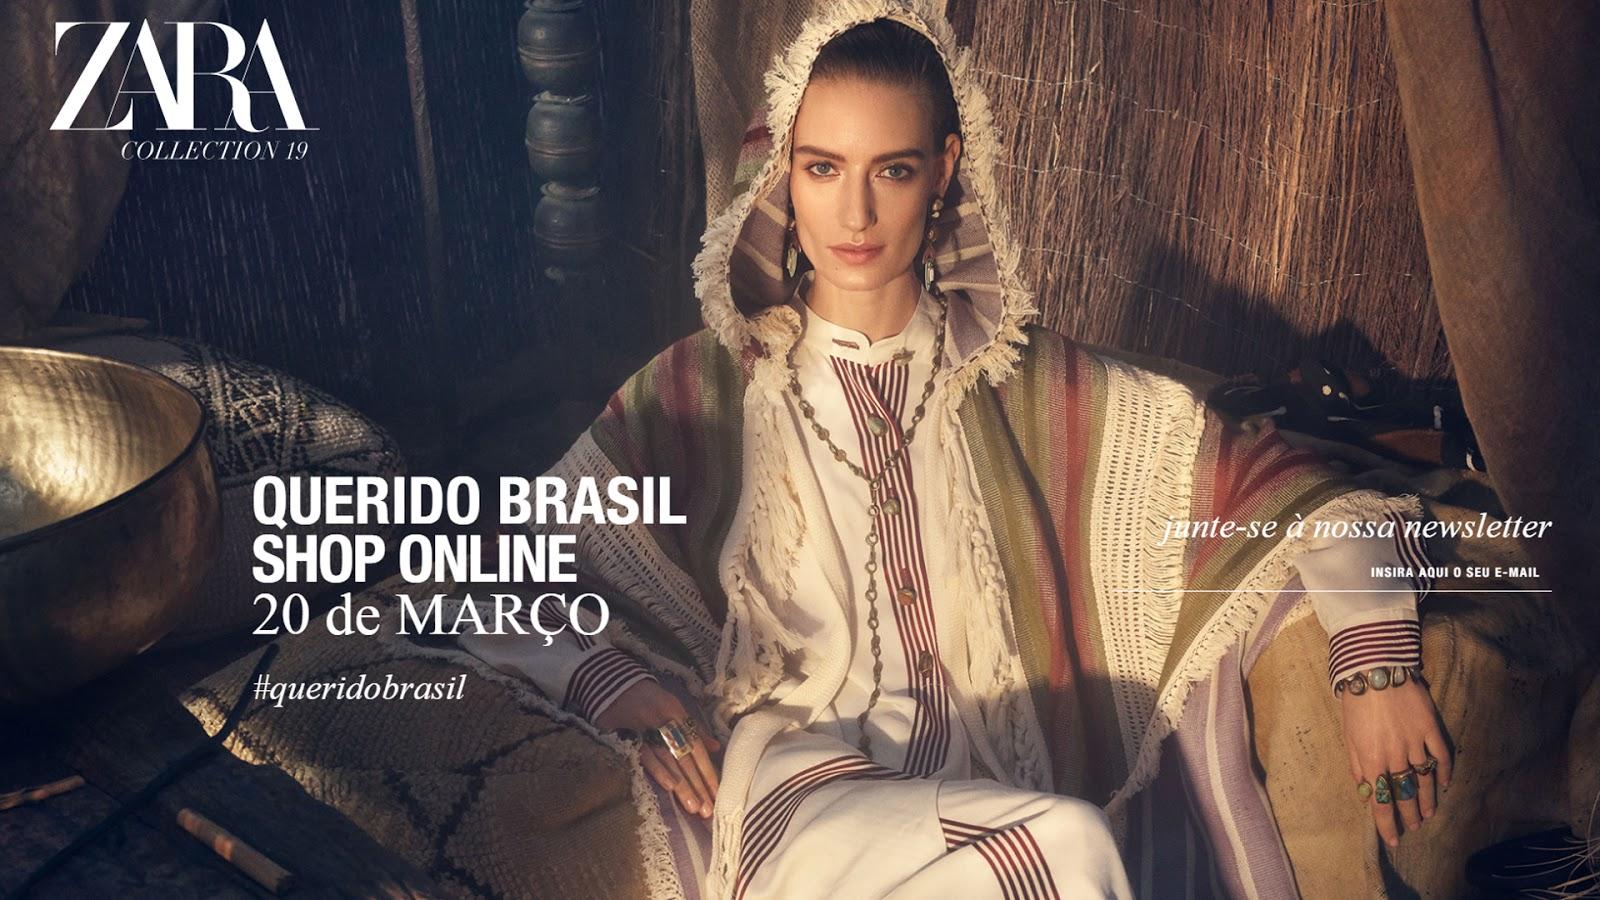 FINALMENTE: ZARA LANÇA LOJA ONLINE NO BRASIL